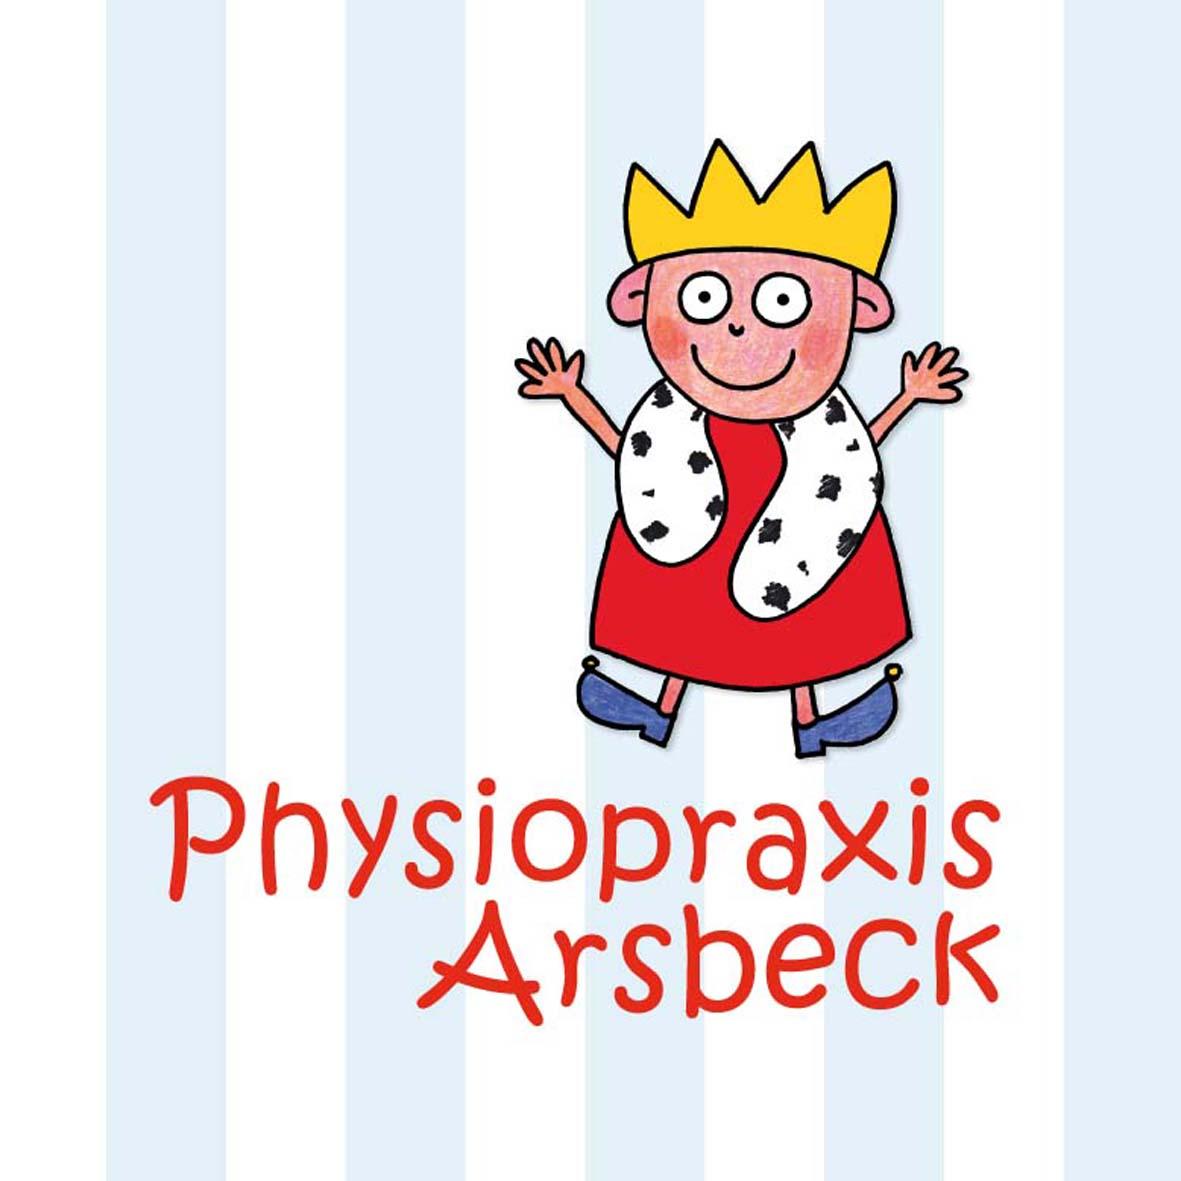 physio_arsbeck_logo